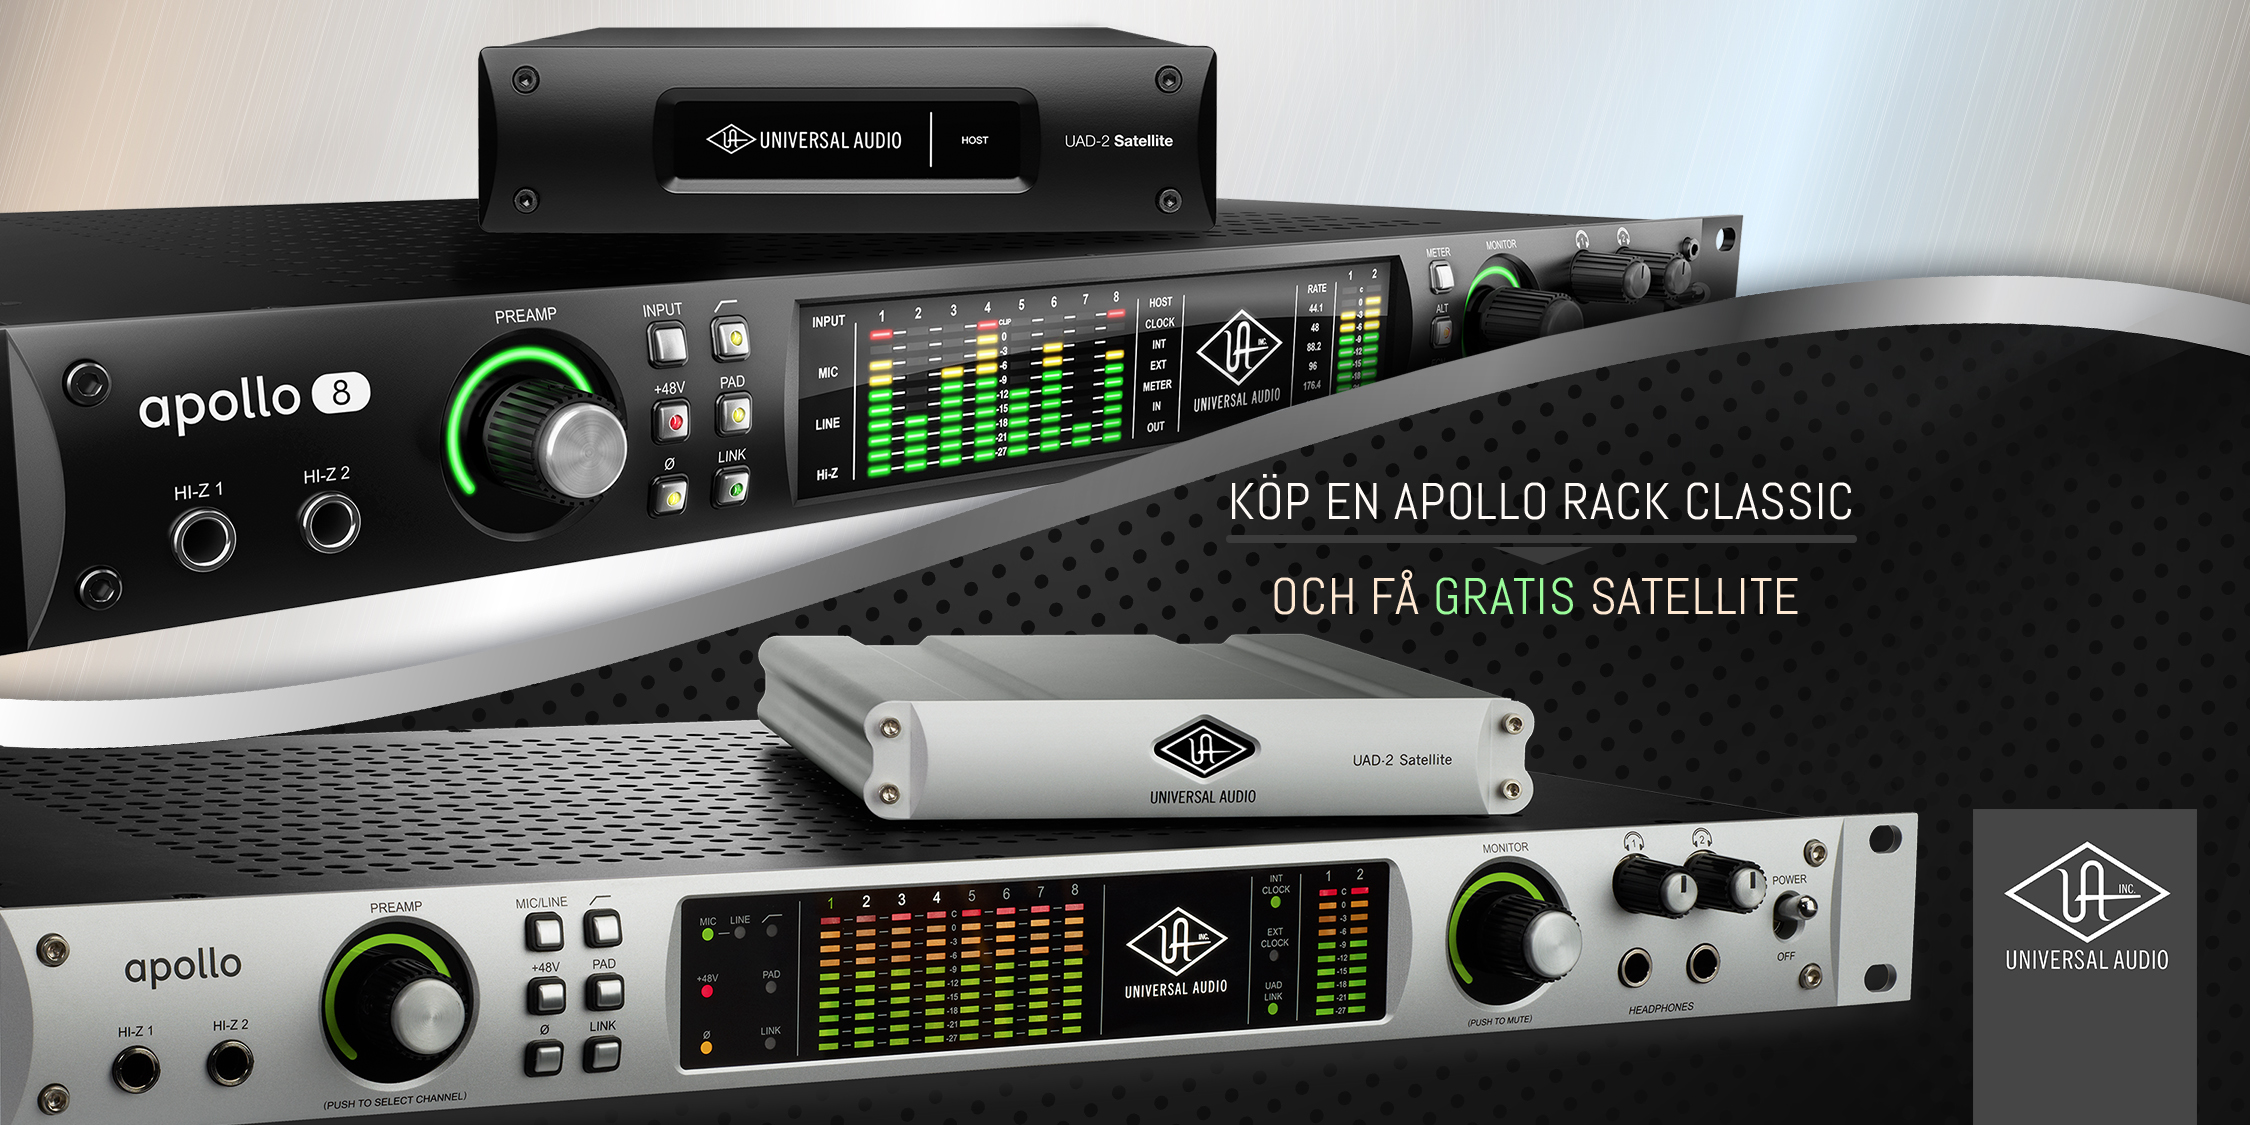 Universal Audio Kampanj – Köp Apollo Rack Classic och få gratis UAD-2 Satellite